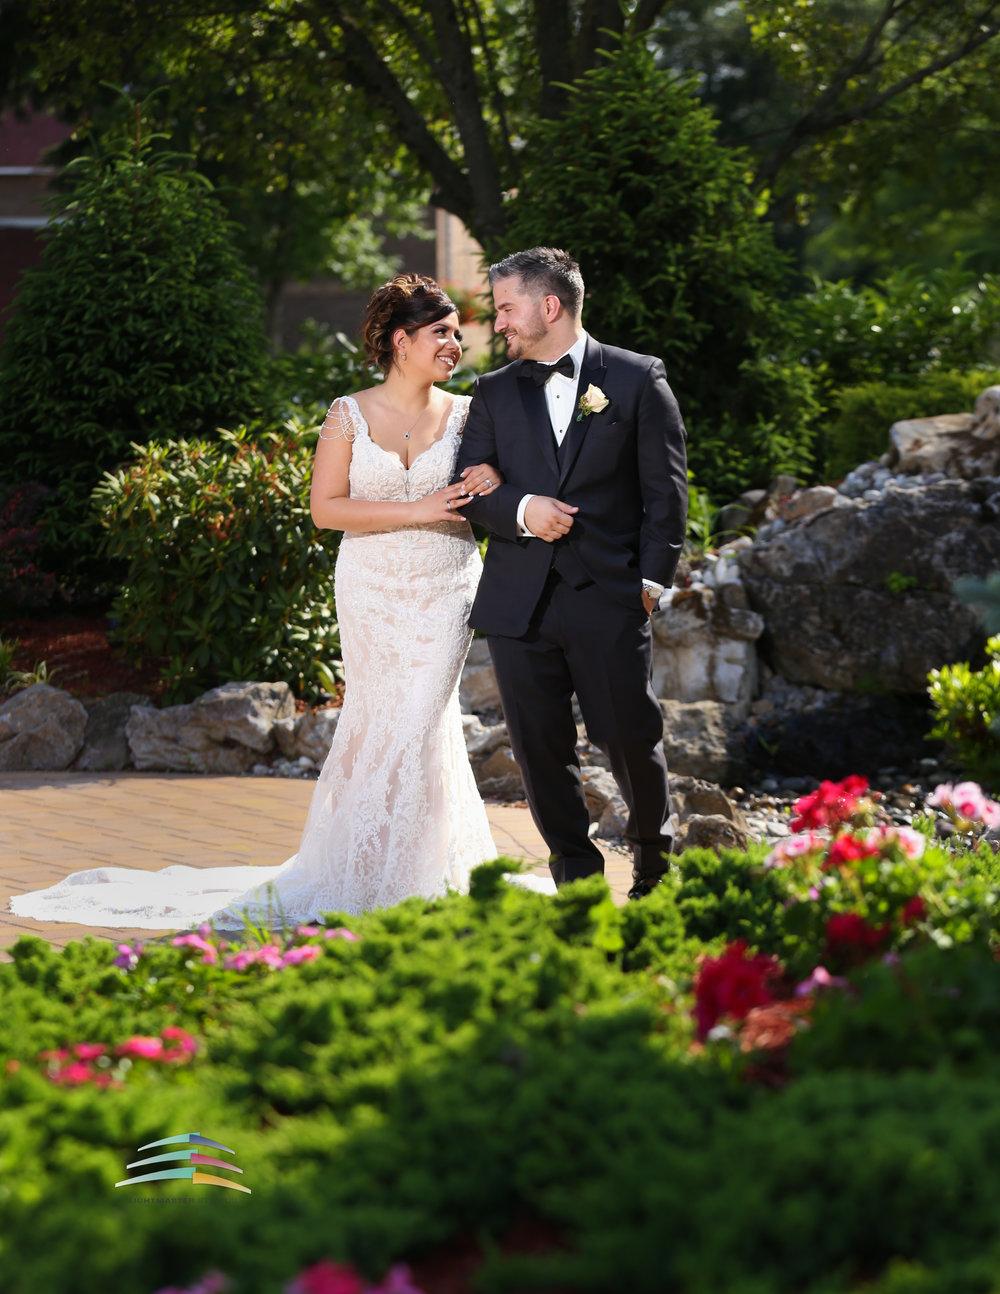 Lightmaster-studios-wedding-couple-outdoor-wedding-water-fountain-east-hanover-manor-new-jersey-mermaid-wedding-dress-red-flowers-pink-flowers